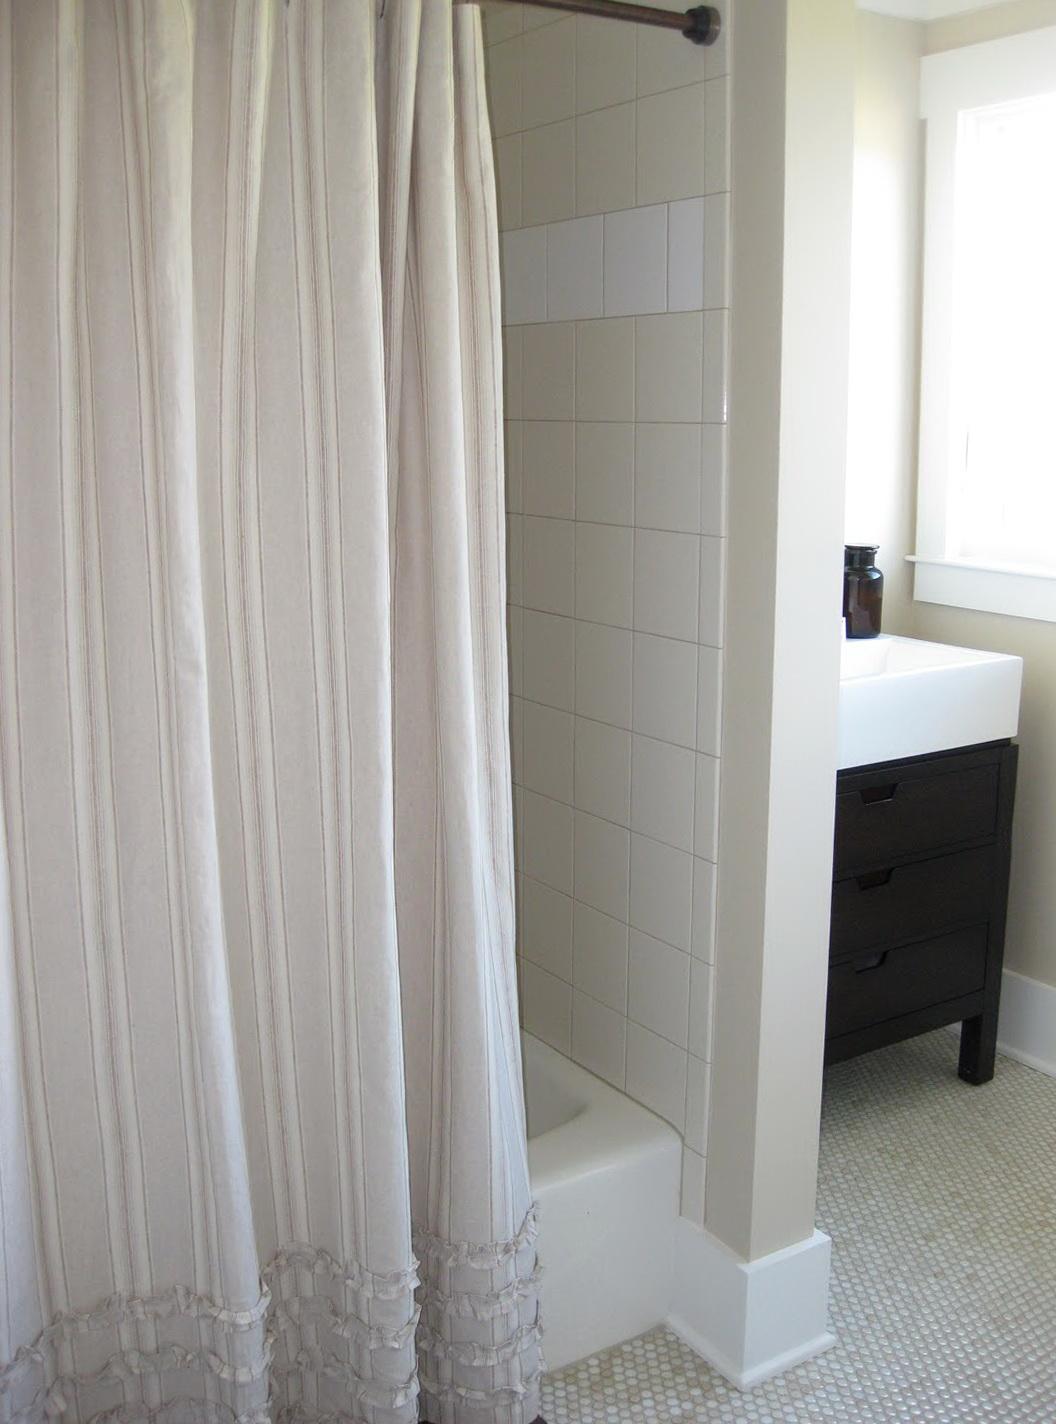 Pottery Barn Shower Curtain Home Design Ideas